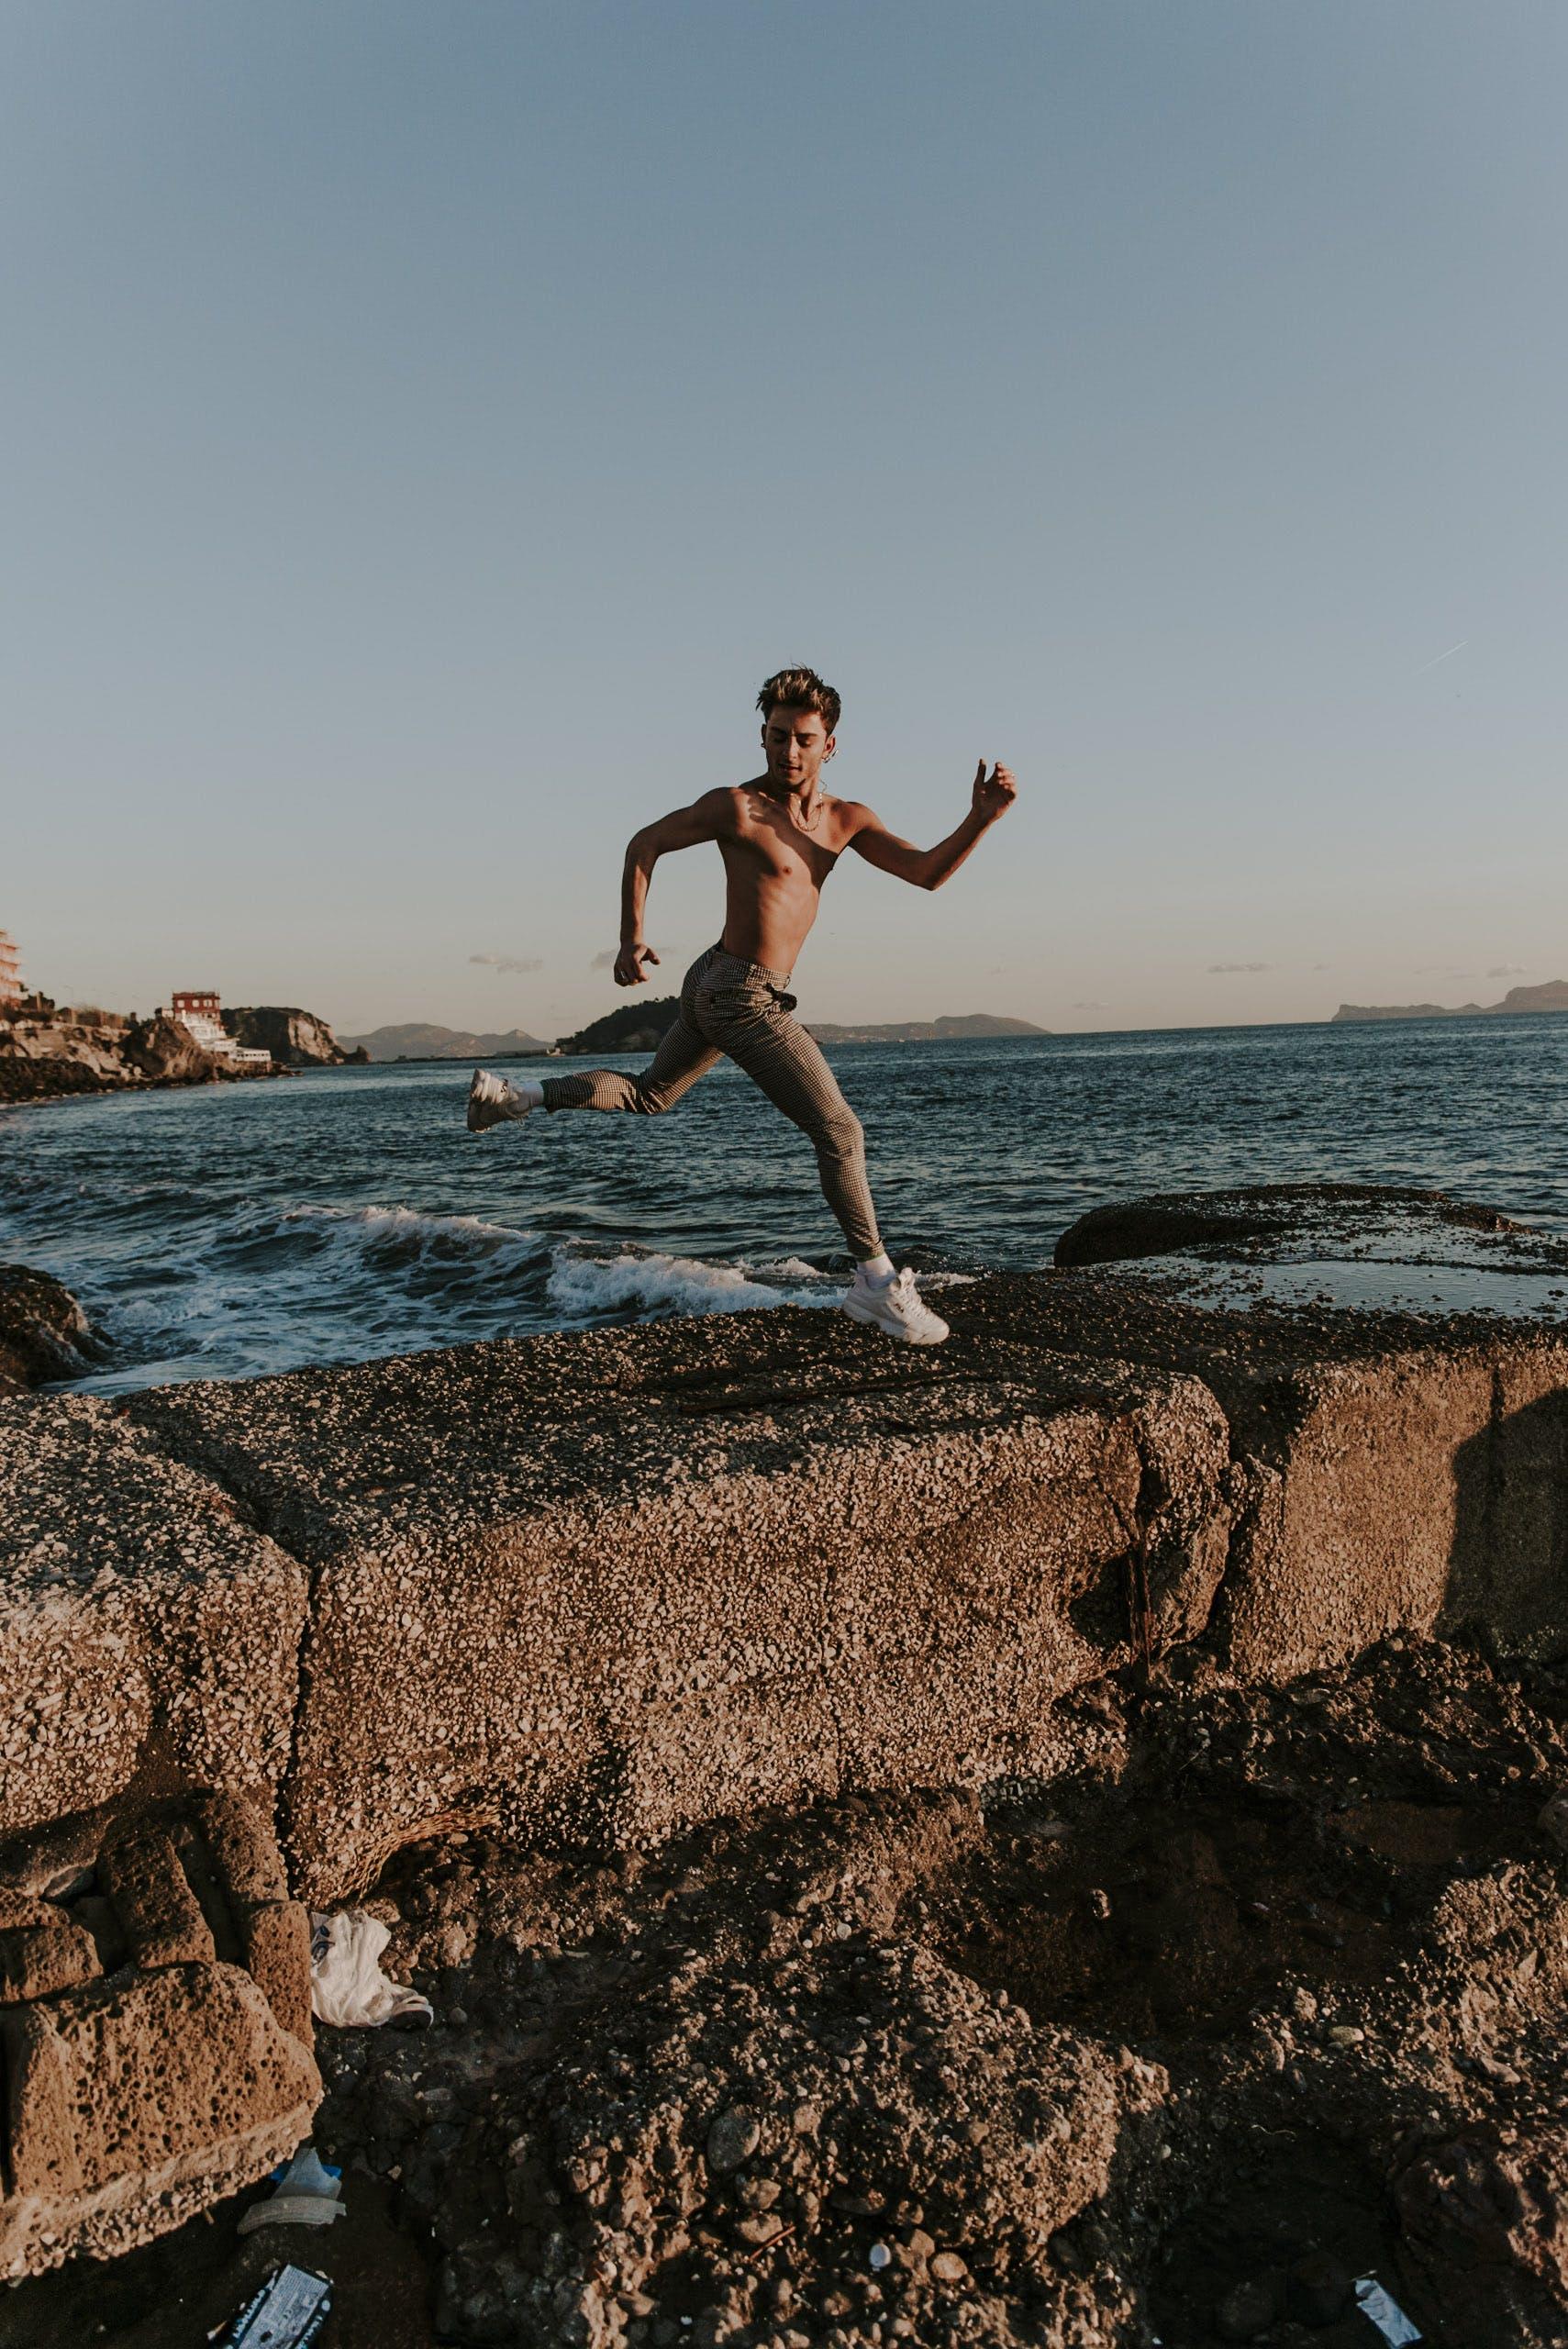 Man Jumping over Brown Barricade Near Shore